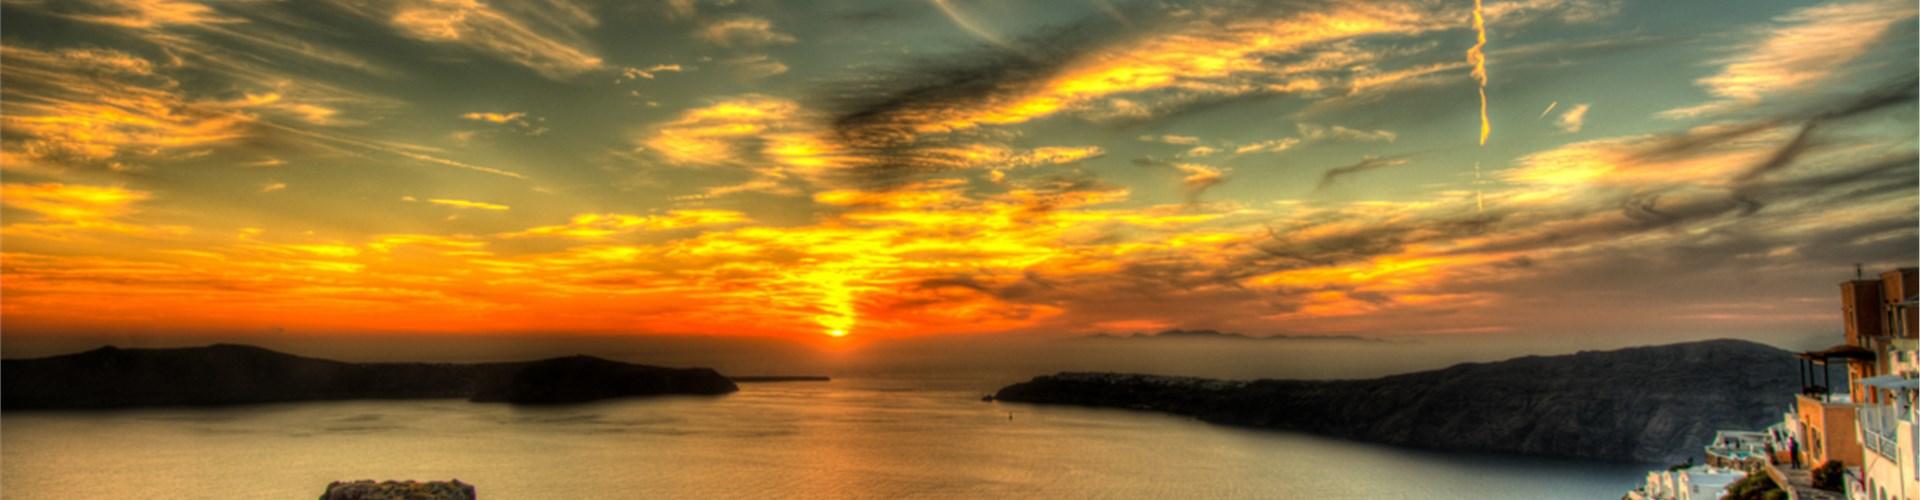 Sunset in Oia - Attractions - Santorini